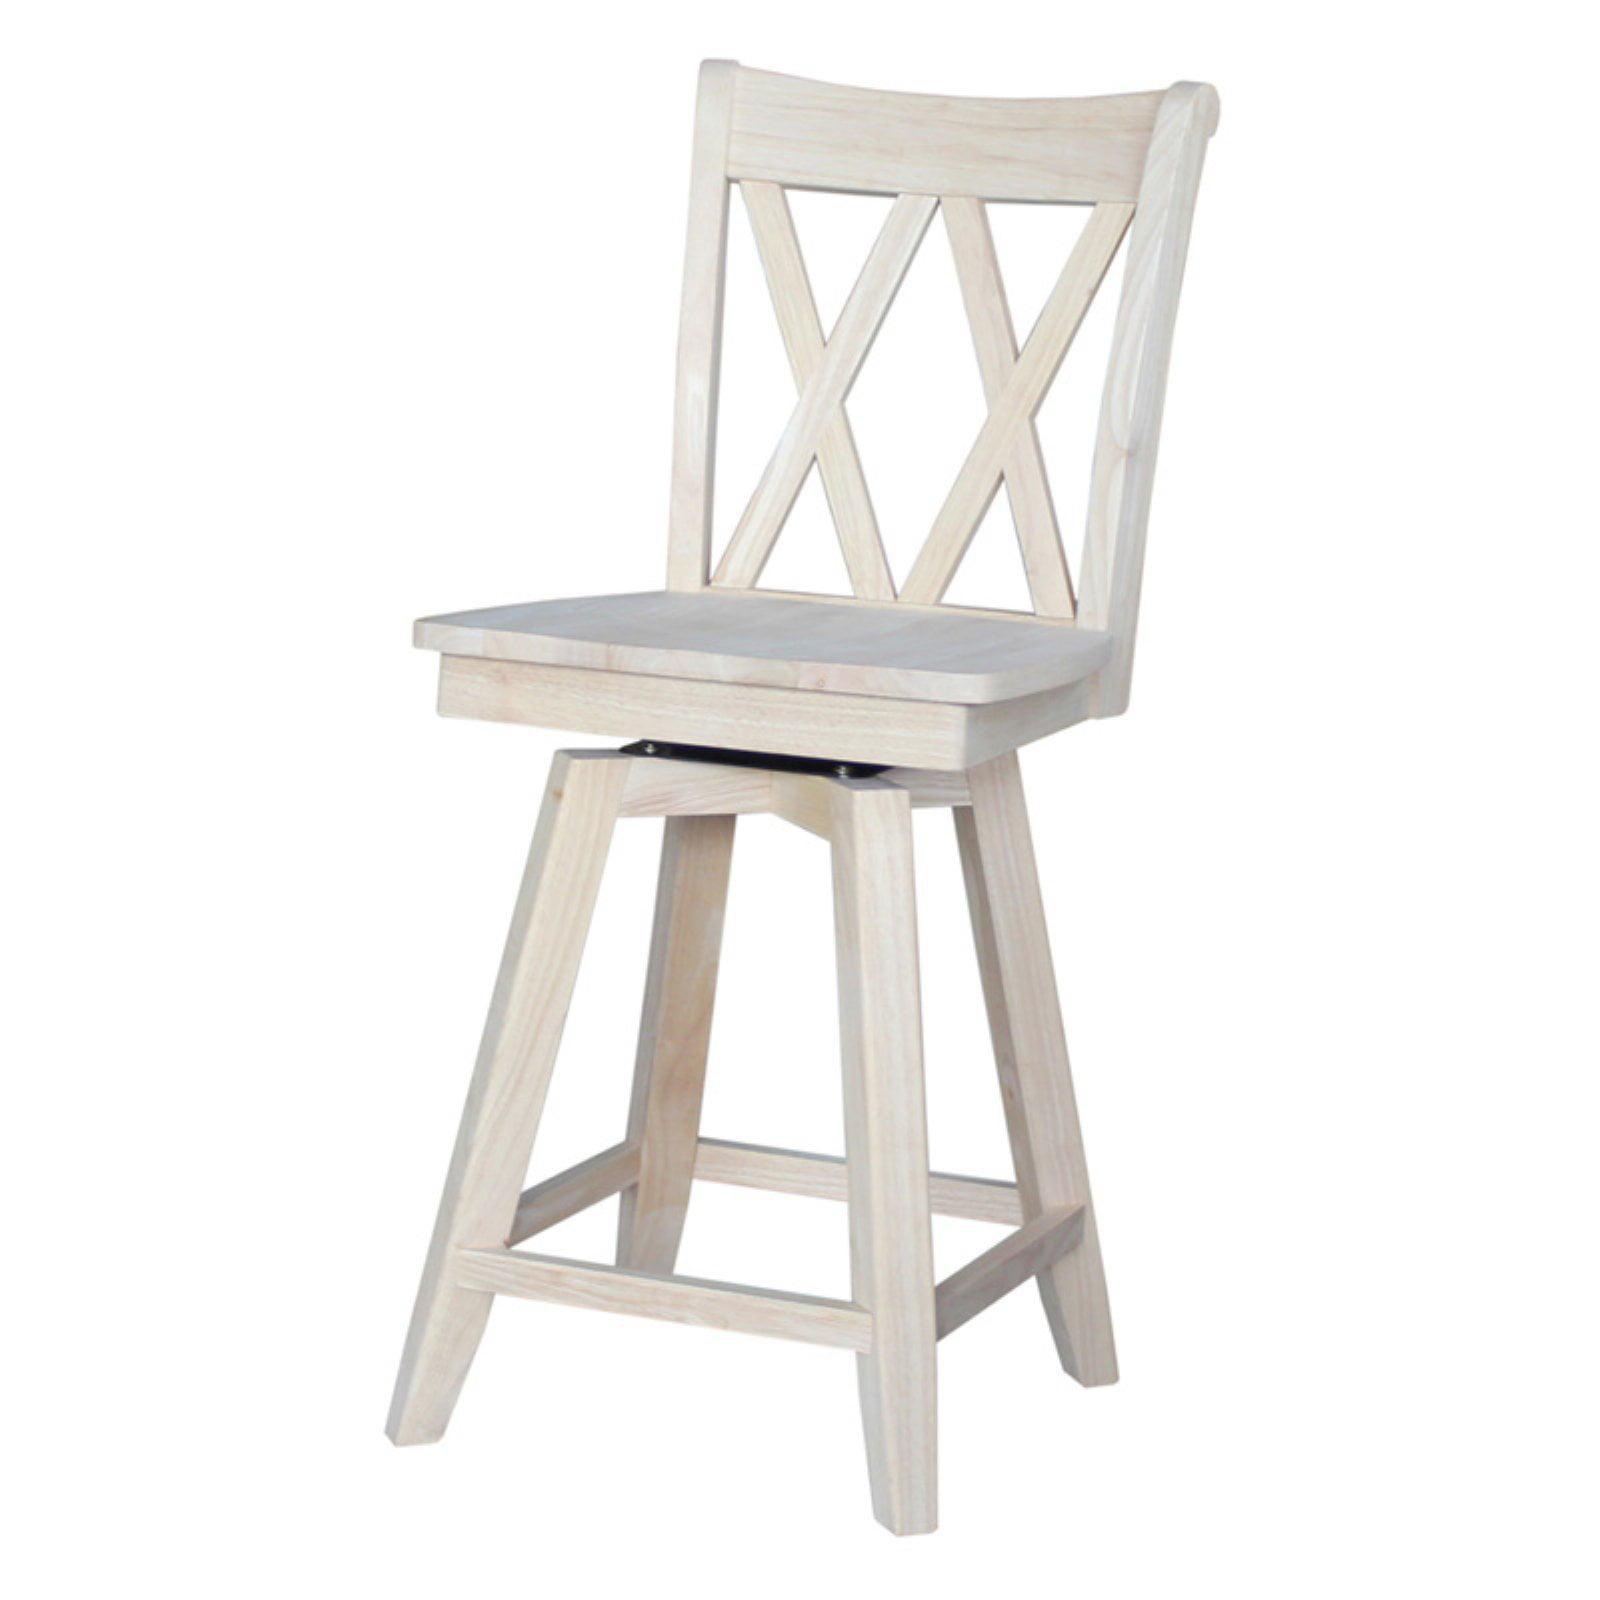 Pleasing International Concepts Double X Back Counter Stool 24 Ready To Finish Creativecarmelina Interior Chair Design Creativecarmelinacom